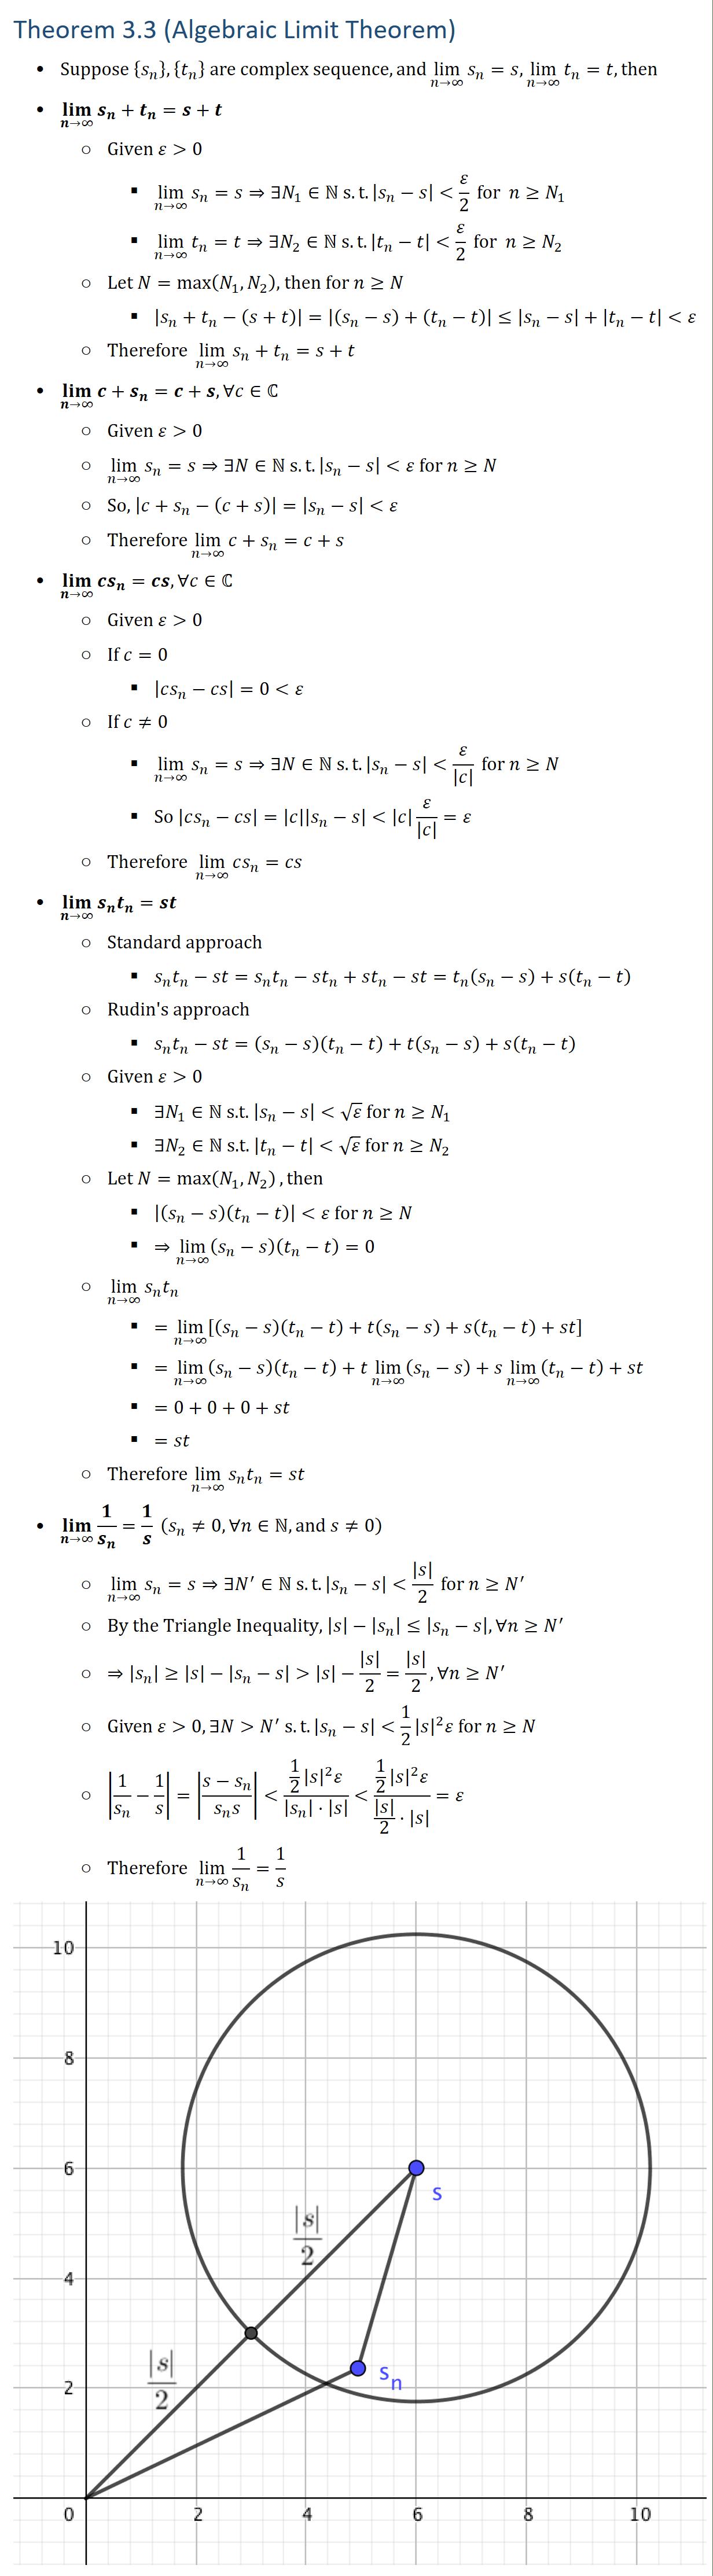 Theorem 3.3 (Algebraic Limit Theorem) • Suppose {s_n },{t_n } are complex sequence, and lim_(n→∞)〖s_n 〗=s,lim_(n→∞)〖t_n 〗=t, then • (lim)_(n→∞)〖s_n+t_n 〗=s+t ○ Given ε 0 § lim_(n→∞)〖s_n 〗=s⇒∃N_1∈N s.t. |s_n−s| ε/2 for n≥N_1 § lim_(n→∞)〖t_n 〗=t⇒∃N_2∈N s.t. |t_n−t| ε/2 for n≥N_2 ○ Let N=max(N_1,N_2 ), then for n≥N § |s_n+t_n−(s+t)|=|(s_n−s)+(t_n−t)|≤|s_n−s|+|t_n−t| ε ○ Therefore lim_(n→∞)〖s_n+t_n 〗=s+t • (lim)_(n→∞)〖c+s_n 〗=c+s, ∀c∈ℂ ○ Given ε 0 ○ lim_(n→∞)〖s_n 〗=s⇒∃N∈N s.t.|s_n−s| ε for n≥N ○ So, |c+s_n−(c+s)|=|s_n−s| ε ○ Therefore lim_(n→∞)〖c+s_n 〗=c+s • (lim)_(n→∞)〖cs_n 〗=cs, ∀c∈ℂ ○ Given ε 0 ○ If c=0 § |cs_n−cs|=0 ε ○ If c≠0 § lim_(n→∞)〖s_n 〗=s⇒∃N∈N s.t. |s_n−s| ε/|c| for n≥N § So |cs_n−cs|=|c||s_n−s| |c| ε/|c| =ε ○ Therefore lim_(n→∞)〖cs_n 〗=cs • (lim)_(n→∞)〖s_n t_n 〗=st ○ Standard approach § s_n t_n−st=s_n t_n−st_n+st_n−st=t_n (s_n−s)+s(t_n−t) ○ Rudin s approach § s_n t_n−st=(s_n−s)(t_n−t)+t(s_n−s)+s(t_n−t) ○ Given ε 0 § ∃N_1∈N s.t. |s_n−s| √ε for n≥N_1 § ∃N_2∈N s.t. |t_n−t| √ε for n≥N_2 ○ Let N=max(N_1,N_2 ),then § |(s_n−s)(t_n−t)| ε for n≥N § ⇒lim_(n→∞)(s_n−s)(t_n−t)=0 ○ lim_(n→∞)〖s_n t_n 〗 § =lim_(n→∞)[(s_n−s)(t_n−t)+t(s_n−s)+s(t_n−t)+st] § =lim_(n→∞)(s_n−s)(t_n−t)+t lim_(n→∞)(s_n−s)+s lim_(n→∞)(t_n−t)+st § =0+0+0+st § =st ○ Therefore lim_(n→∞)〖s_n t_n 〗=st • (lim)_(n→∞)〖1/s_n 〗=1/s (s_n≠0, ∀n∈N and s≠0) ○ lim_(n→∞)〖s_n 〗=s⇒∃N^′∈N s.t. |s_n−s| |s|/2 for n≥N^′ ○ By the Triangle Inequality, |s|−|s_n |≤|s_n−s|,∀n≥N^′ ○ ⇒|s_n |≥|s|−|s_n−s| |s|−|s|/2=|s|/2,∀n≥N^′ ○ Given ε 0, ∃N N^′ s.t. |s_n−s| 1/2 |s|^2 ε for n≥N ○ |1/s_n −1/s|=|(s−s_n)/(s_n s)| (1/2 |s|^2 ε)/(|s_n |⋅|s| ) (1/2 |s|^2 ε)/(|s|/2⋅|s| )=ε ○ Therefore lim_(n→∞)〖1/s_n 〗=1/s